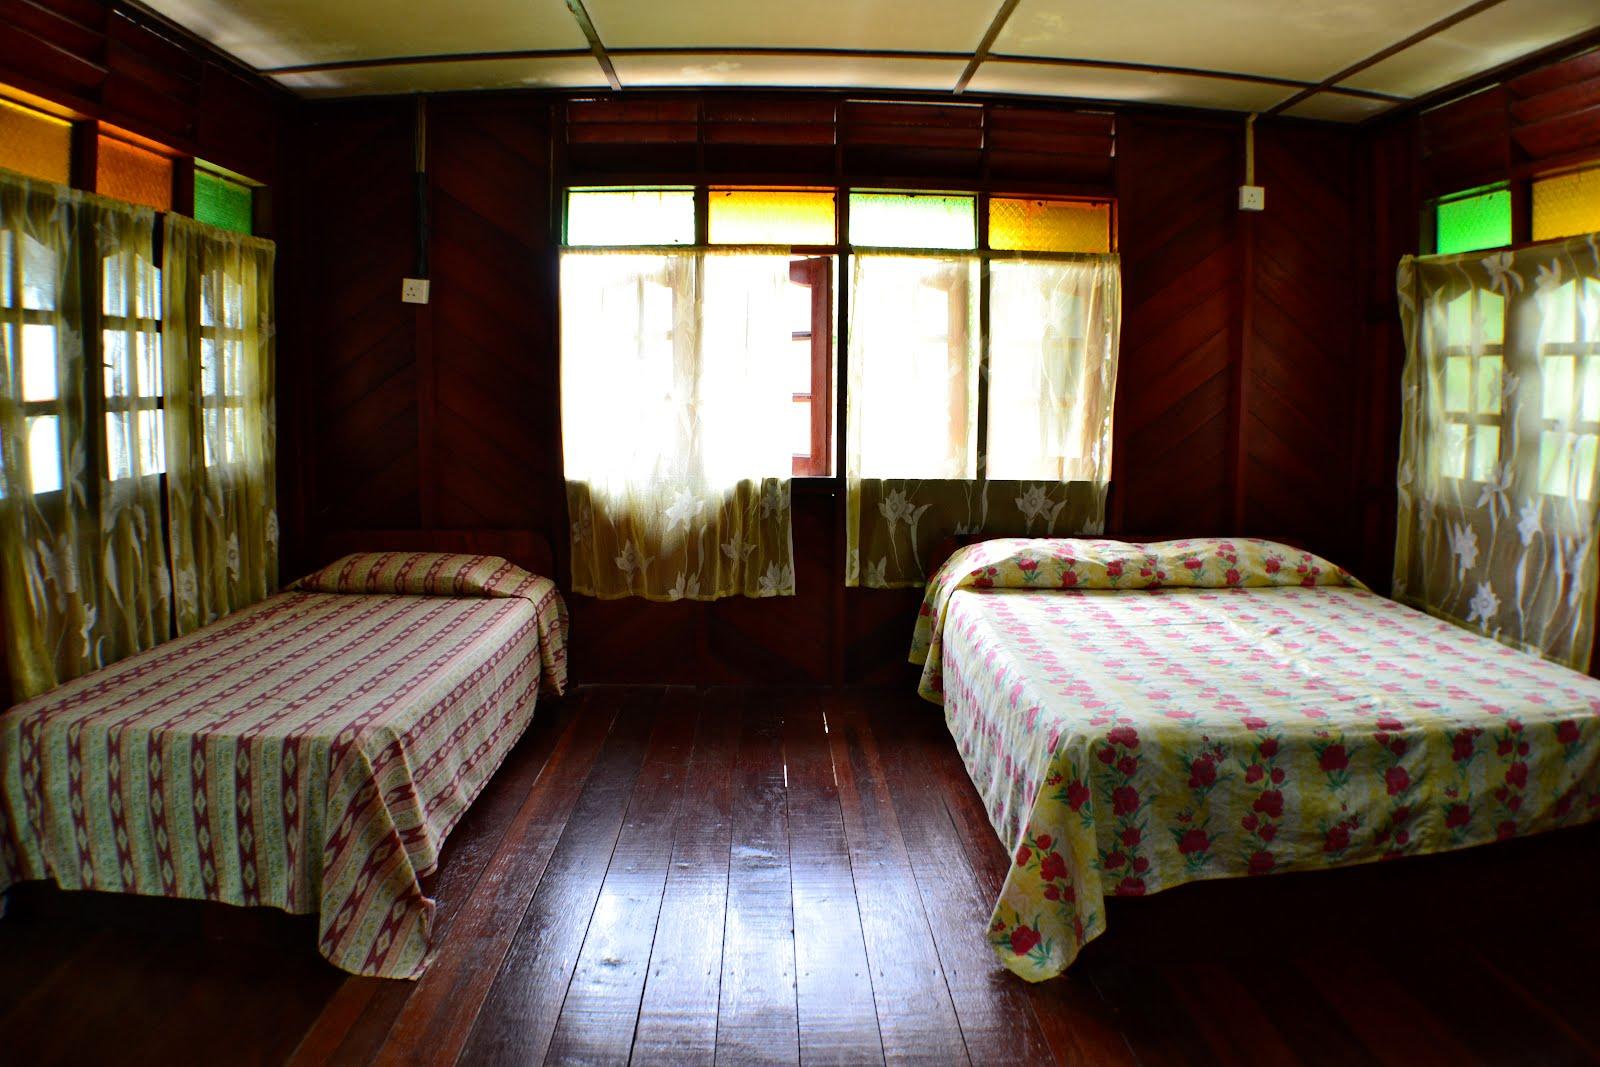 Hiasan Bilik Tidur Rumah Papan Desainrumahid Kayu 1 Unit Chalet Deruan Ombak